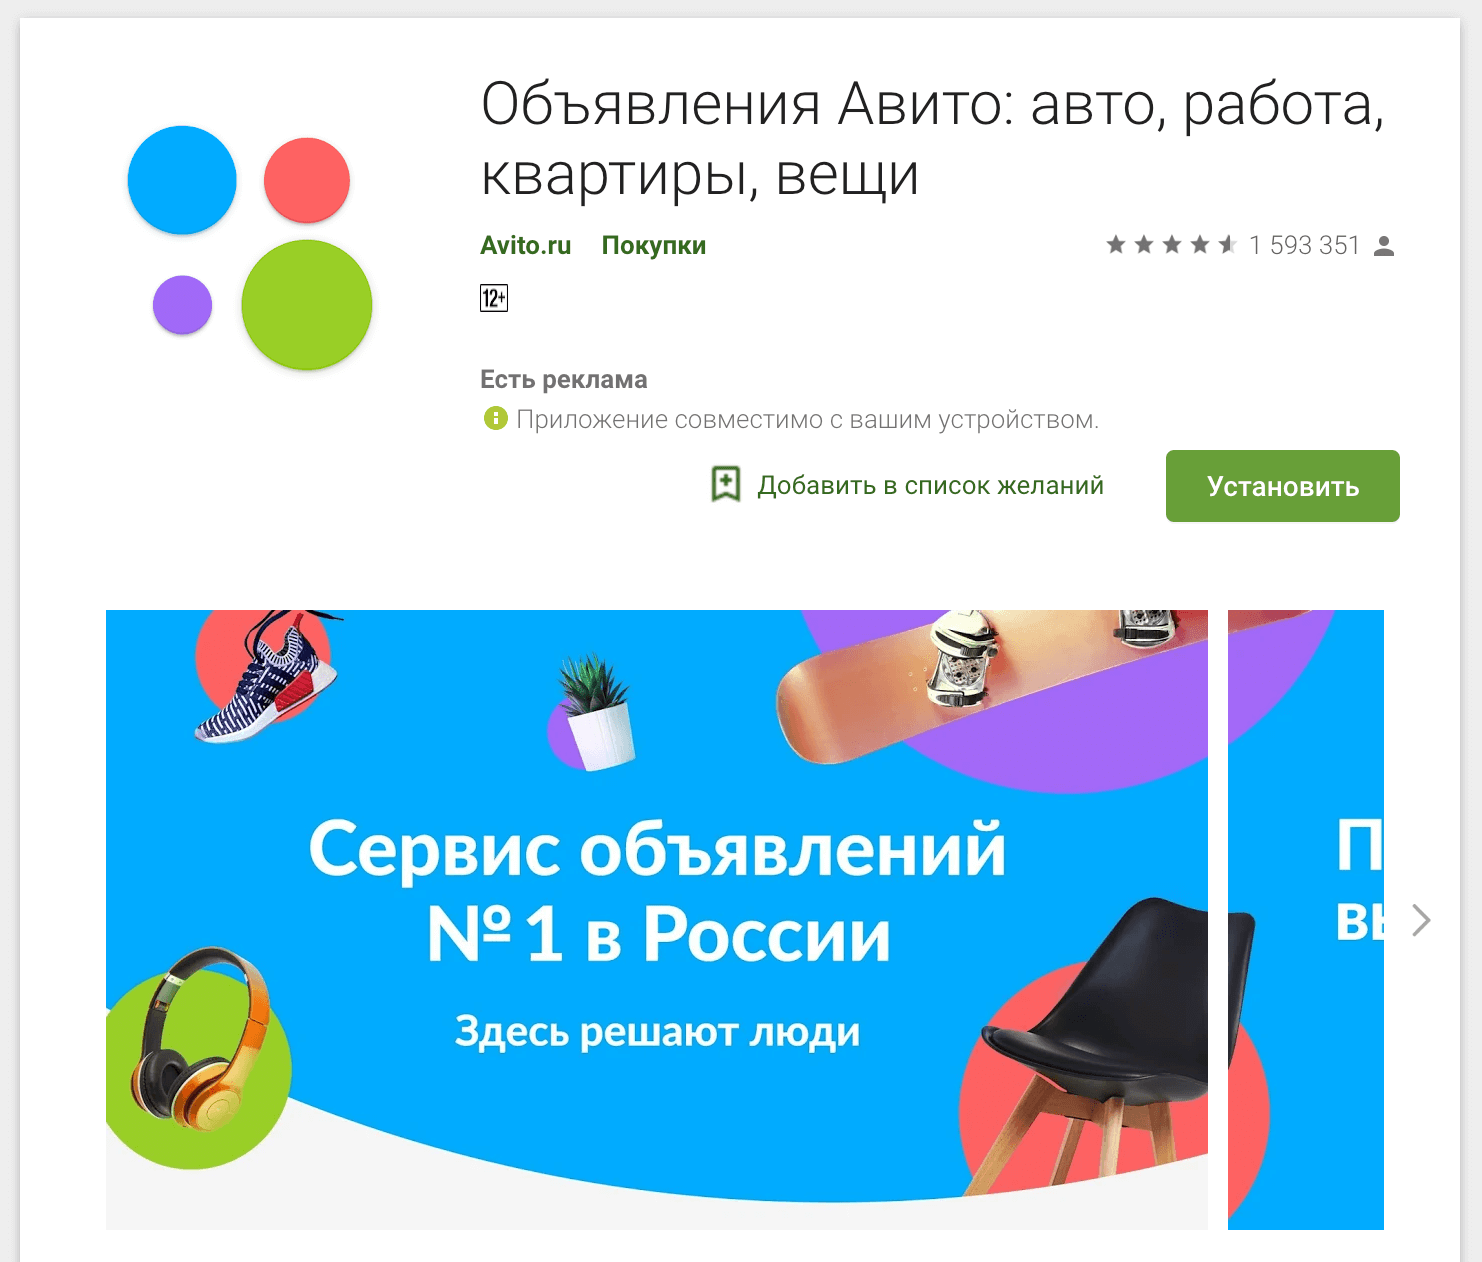 lichnyjj-kabinet-avito_5d07a1bad7601.png